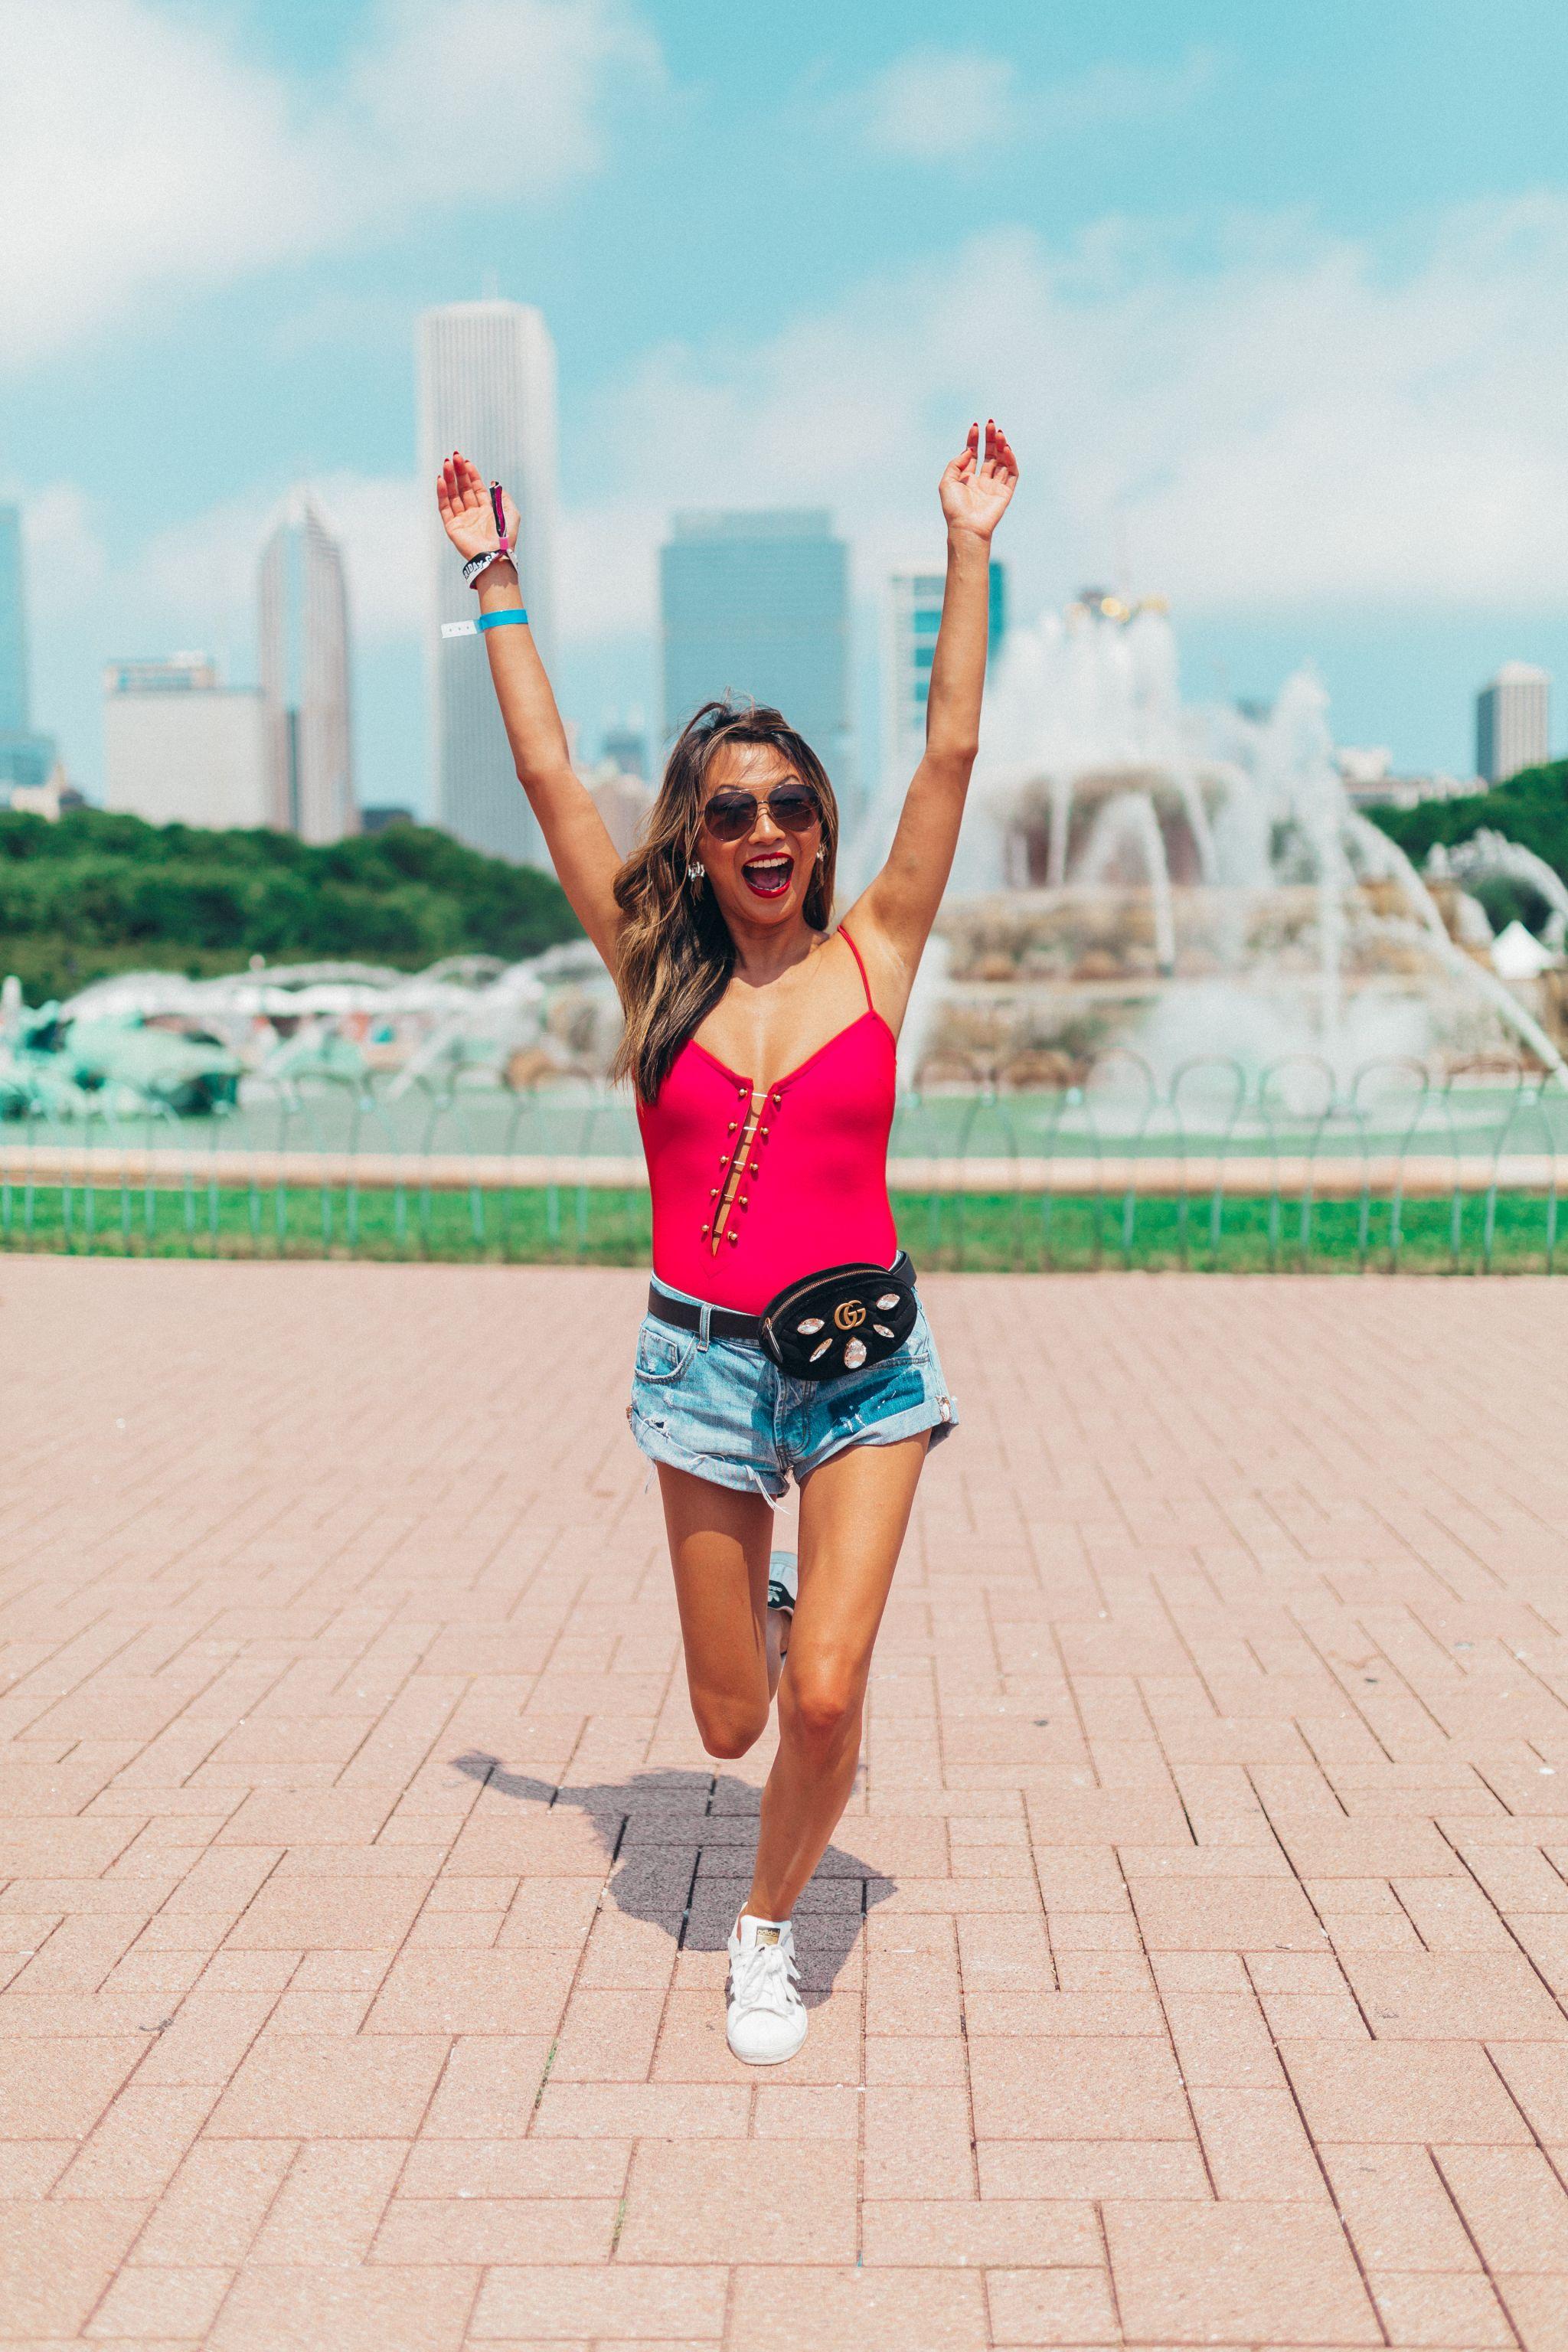 H:ours Mari Bodysuit, Why I love bodysuits, Lollapalooza 2018, Revolve Bodysuit, Jennifer Worman, Chicago Fashion Blogger, Chicago Mommy Blogger